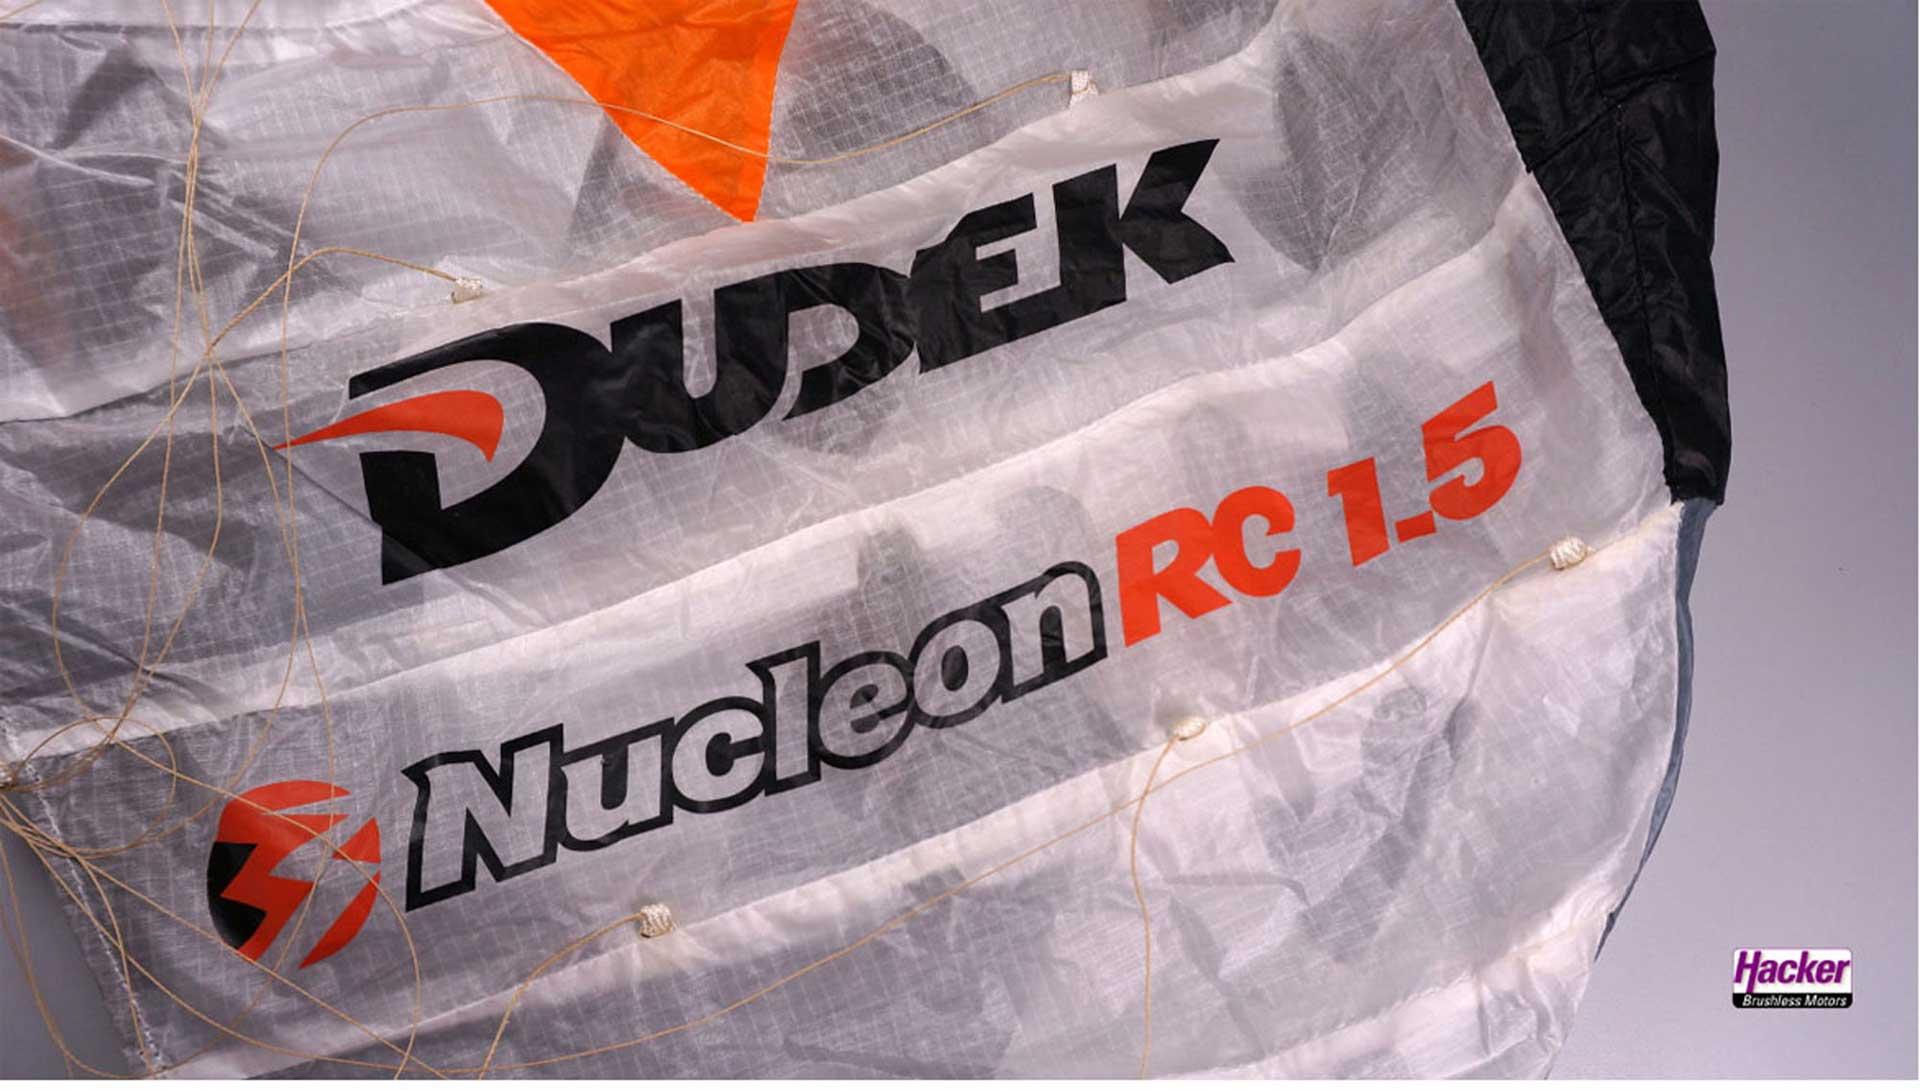 PARA-RC DUDEK NUCLEON 1.5 RC-GLEITSCHIRM